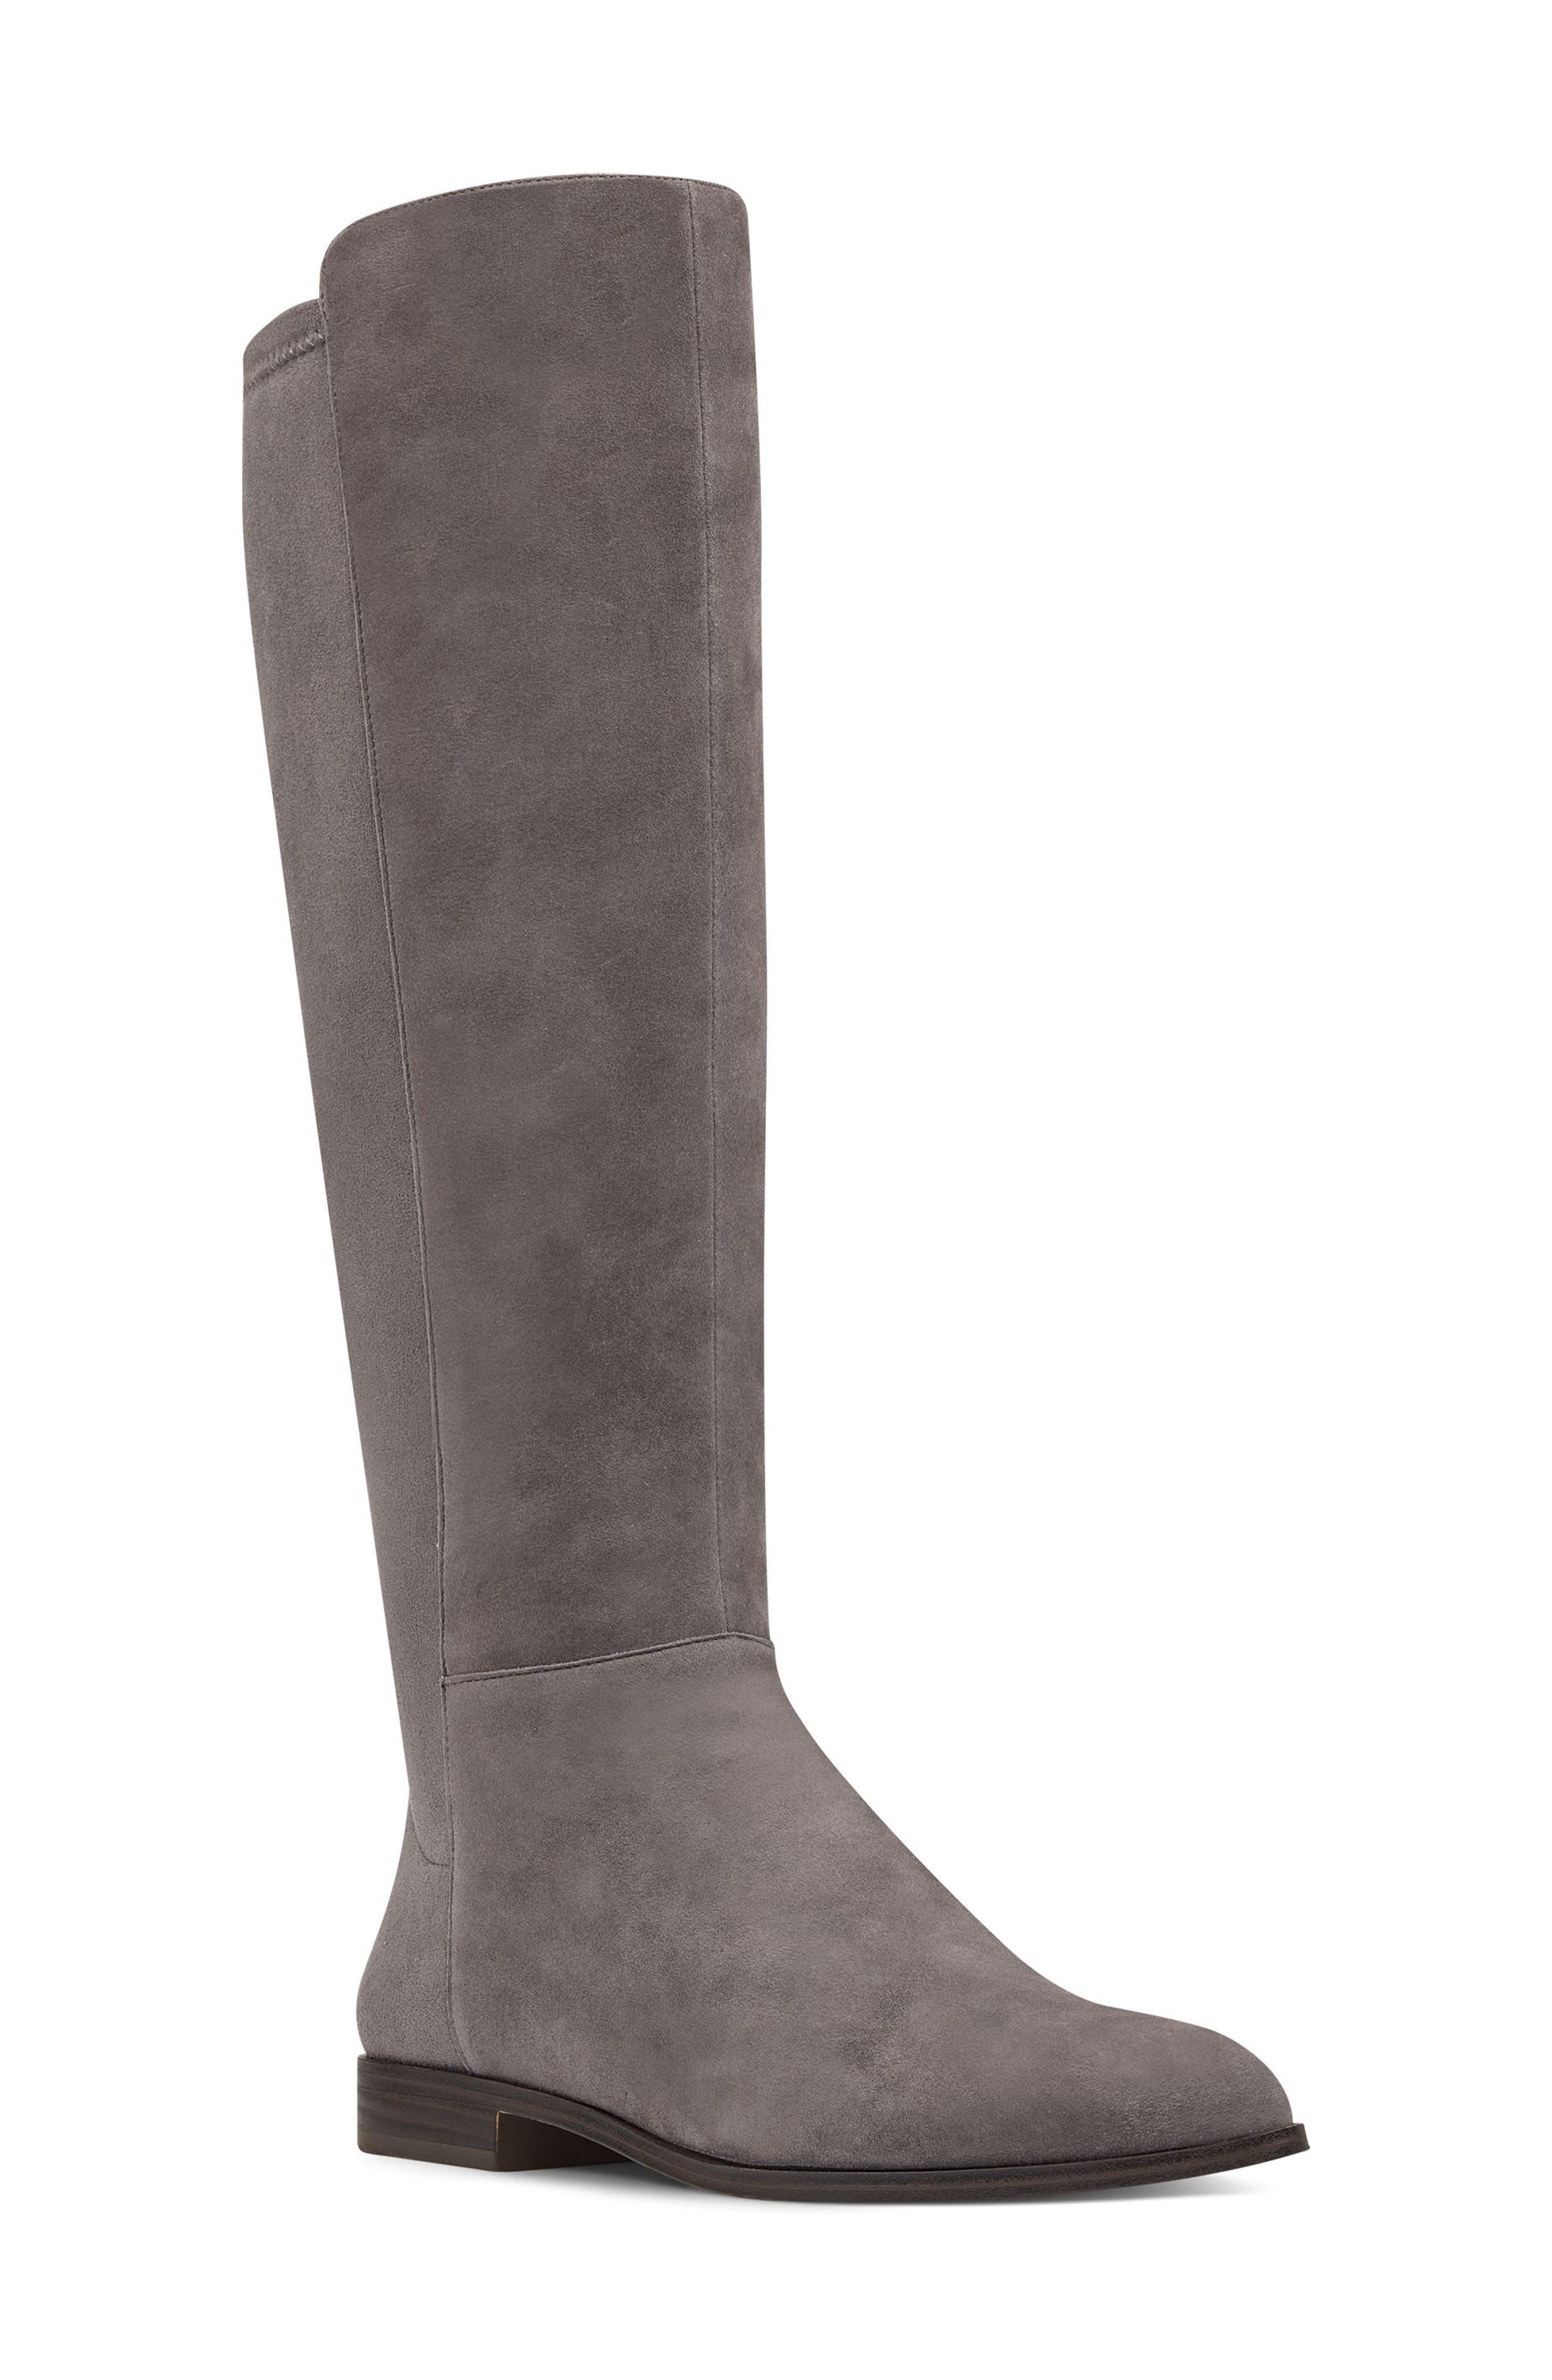 Nine West Owenford Knee High Riding Boot, Regular Calf- Grey